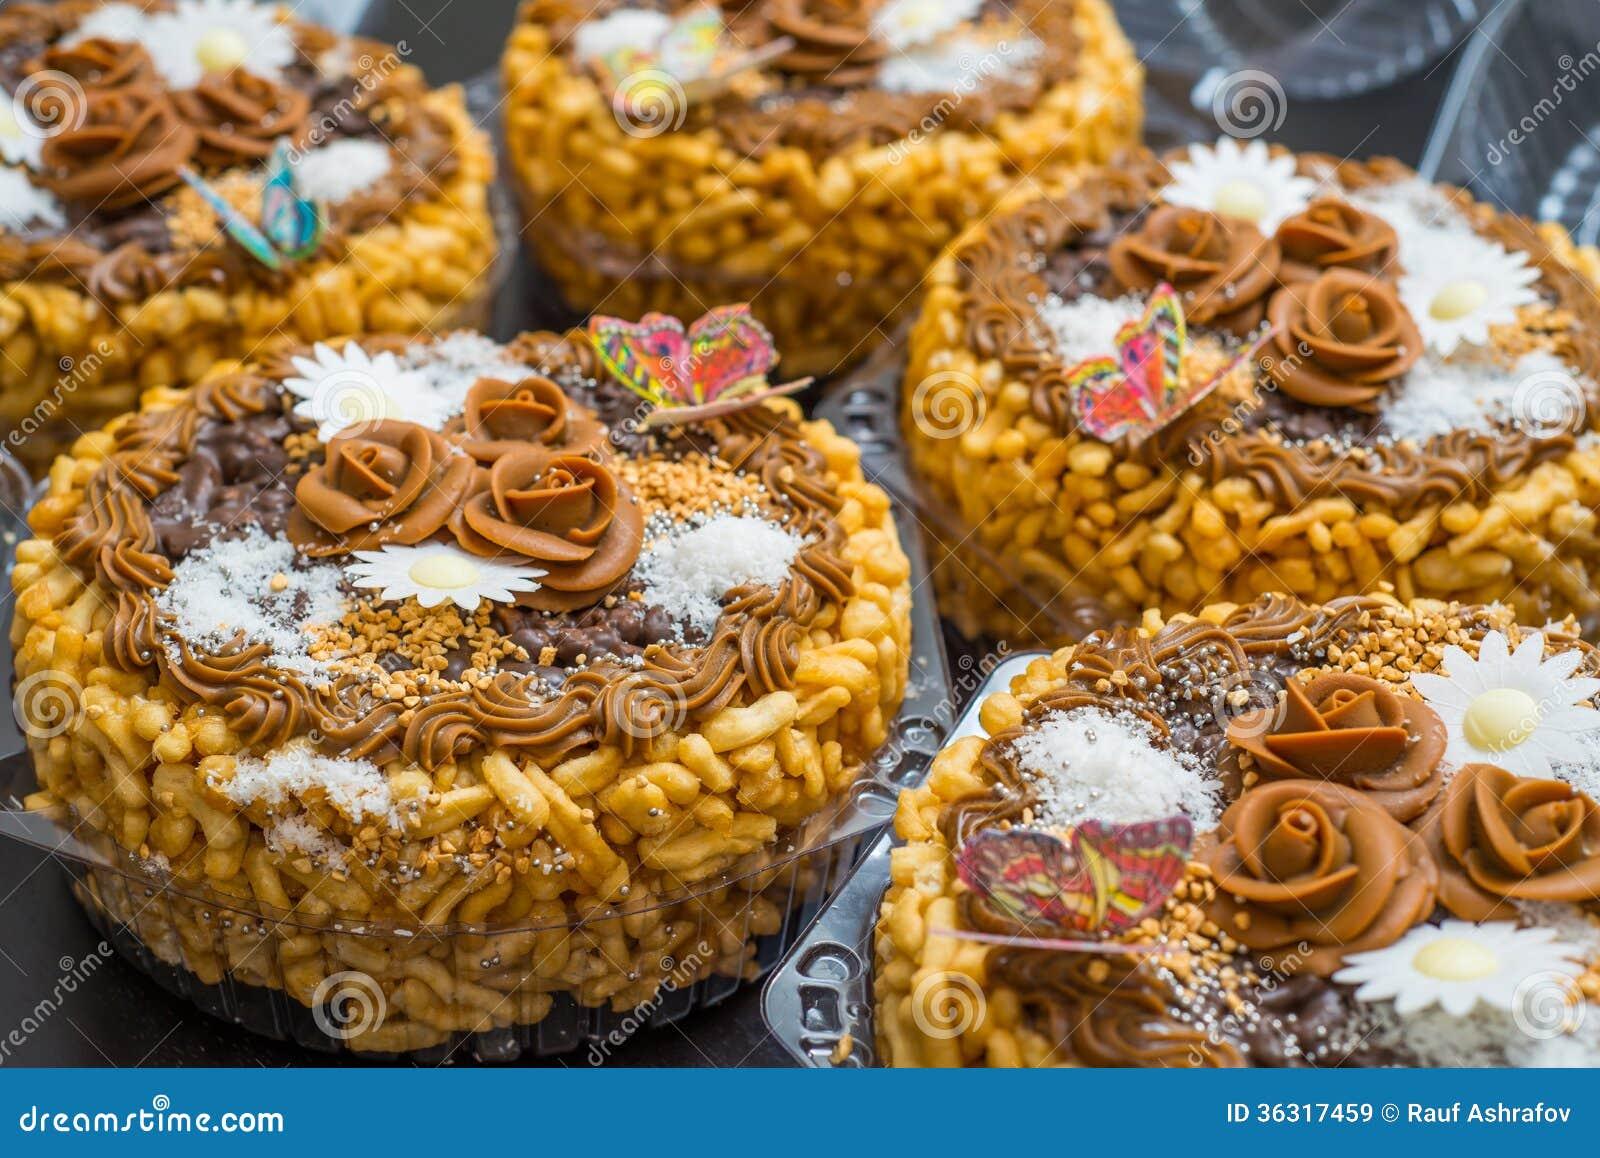 Chak Chak Tatar Traditional Dainty Royalty Free Stock  : chak chak tatar traditional dainty made pastry grains nuts 36317459 from www.dreamstime.com size 1300 x 957 jpeg 235kB